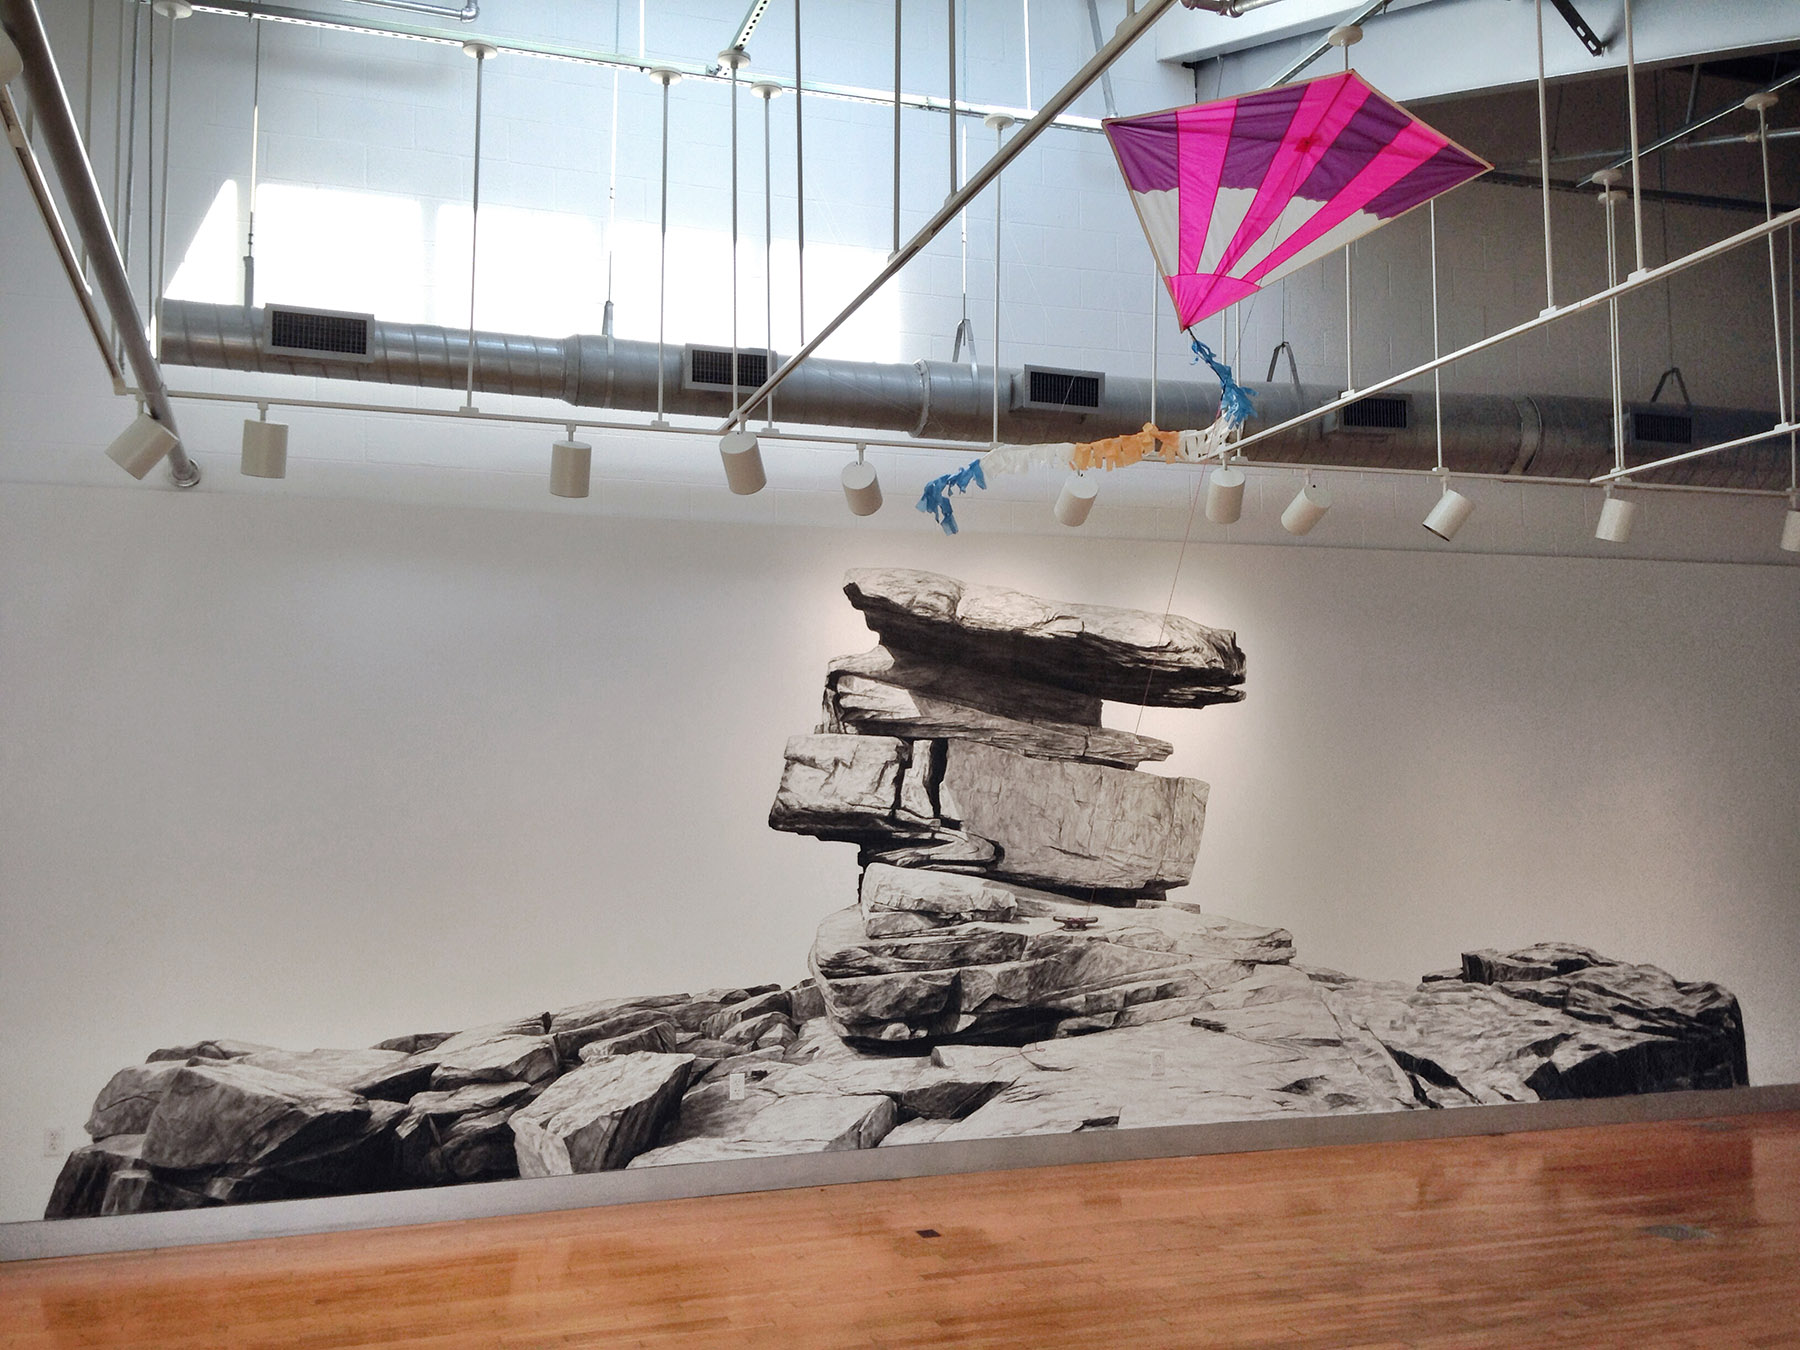 Phillip Adams Kite Line installation at Dickinson College